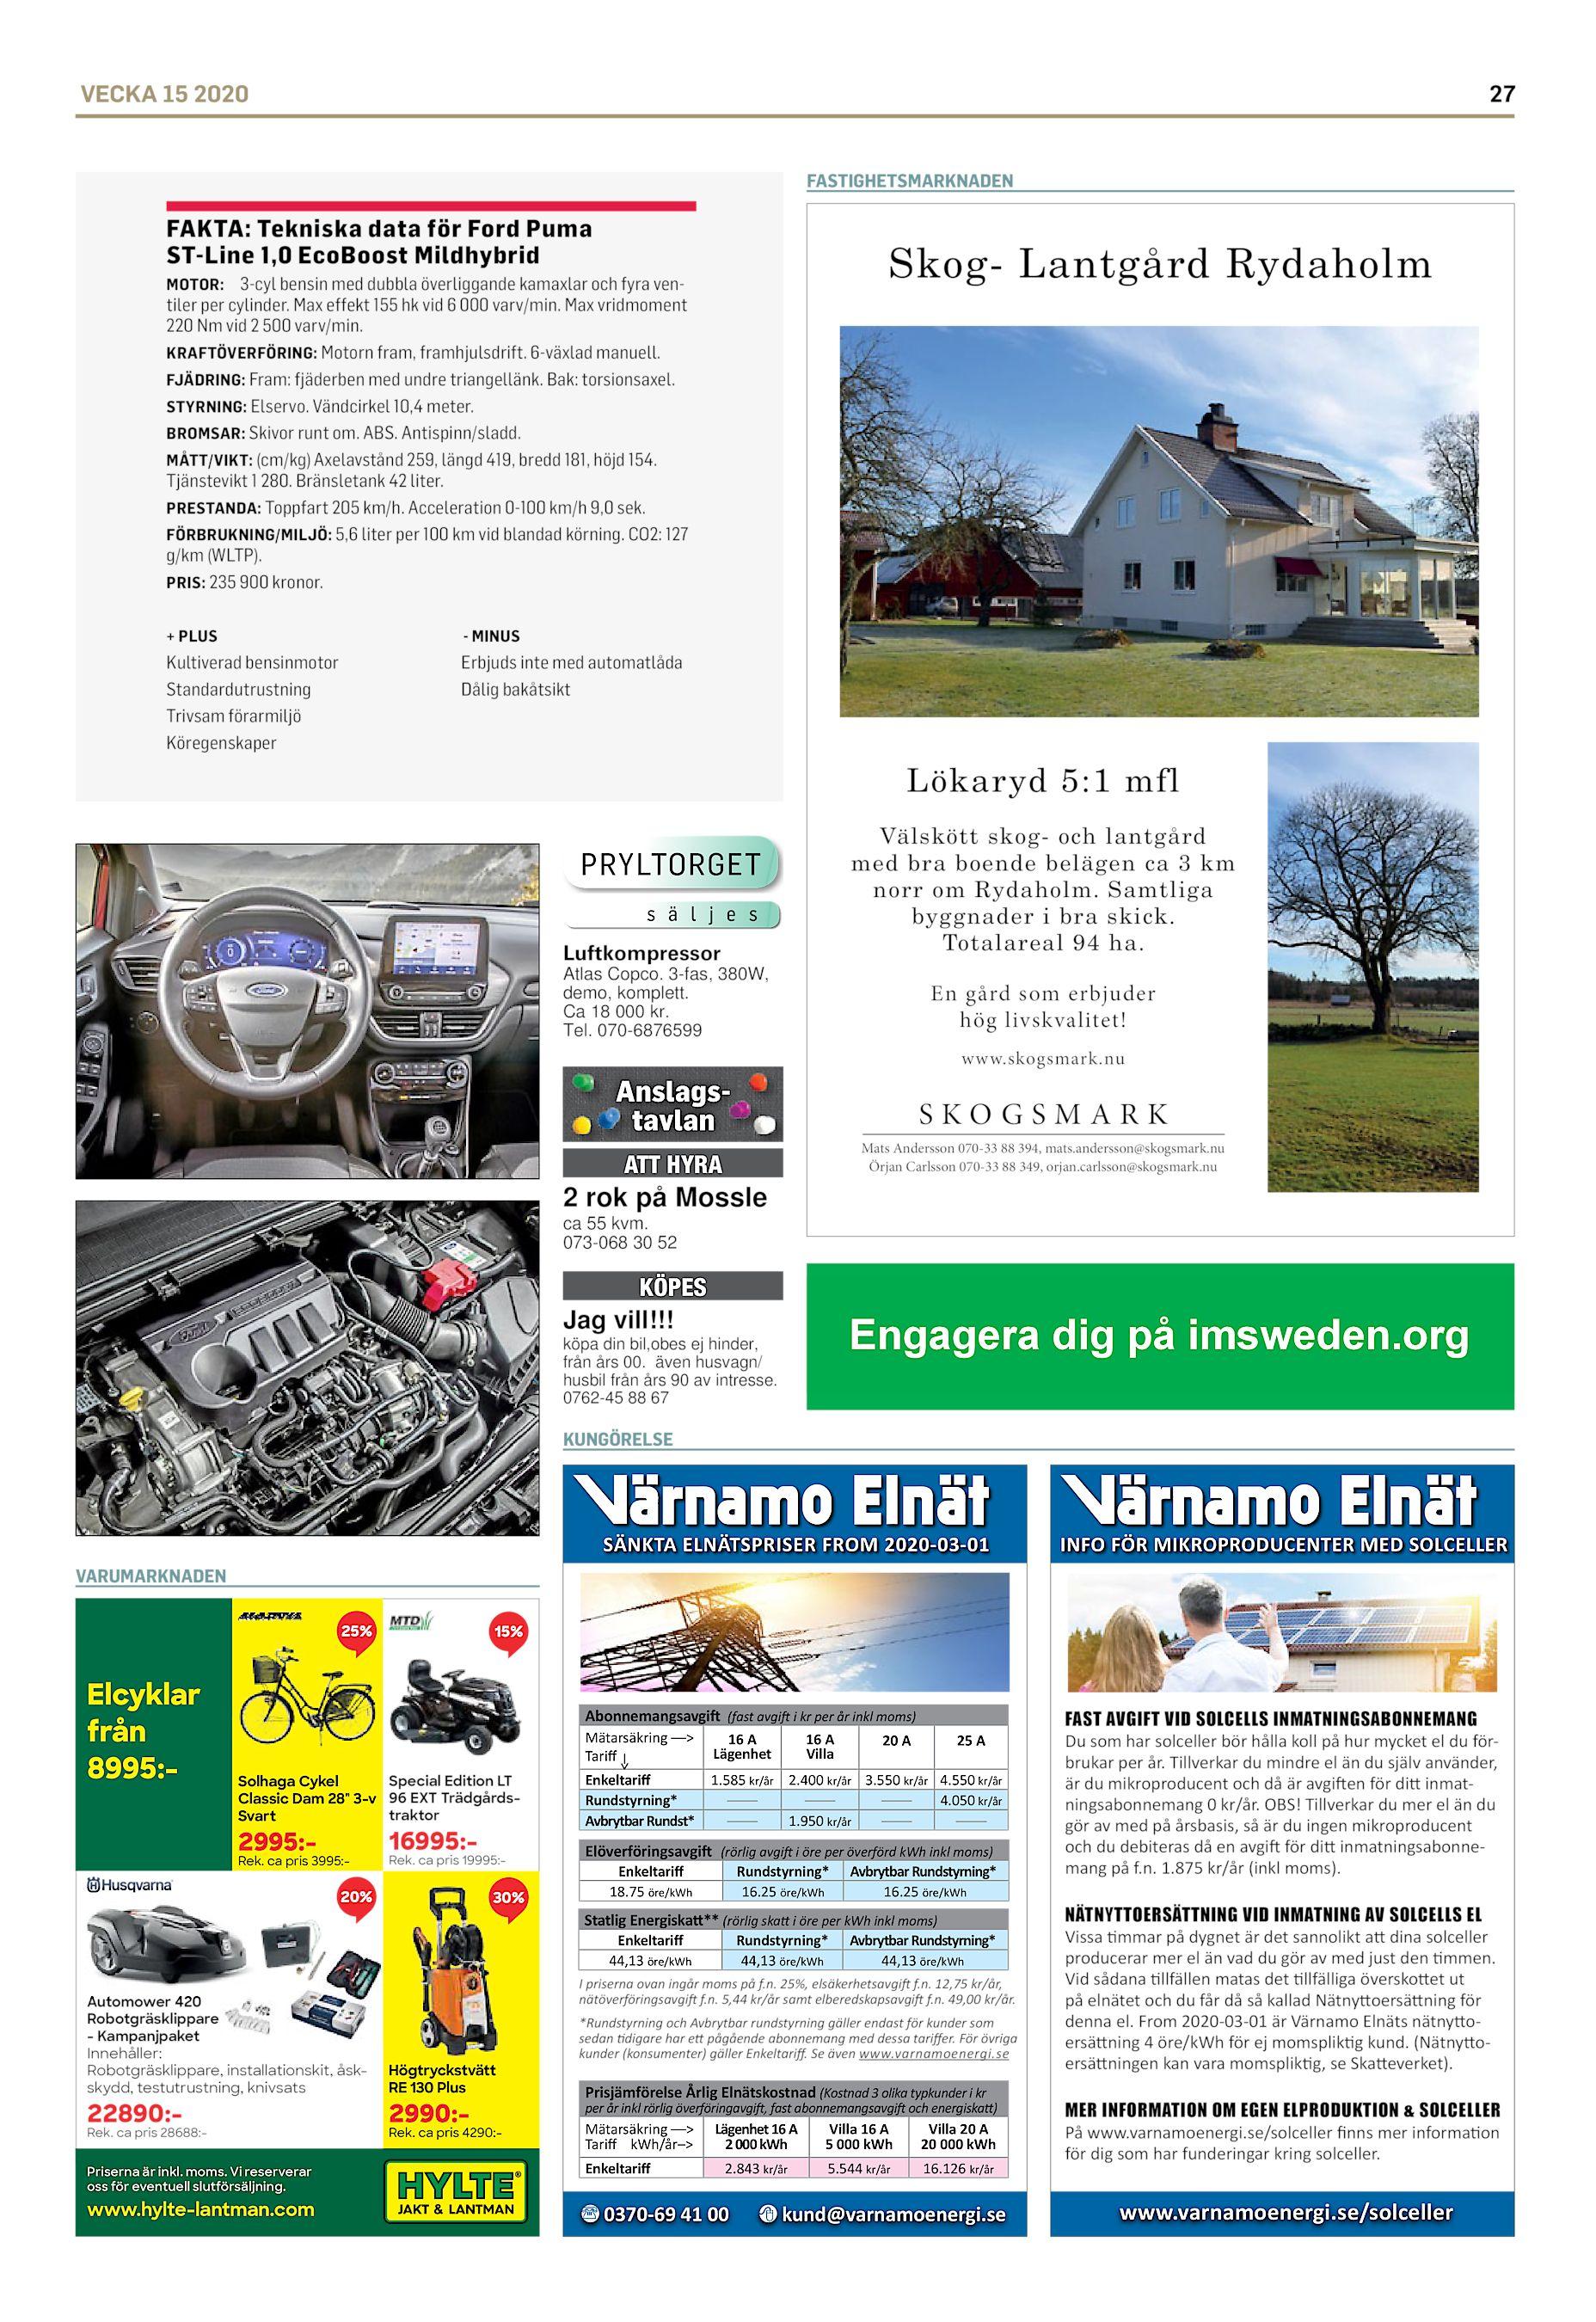 Svenska Fglar - Metropol Auktioner